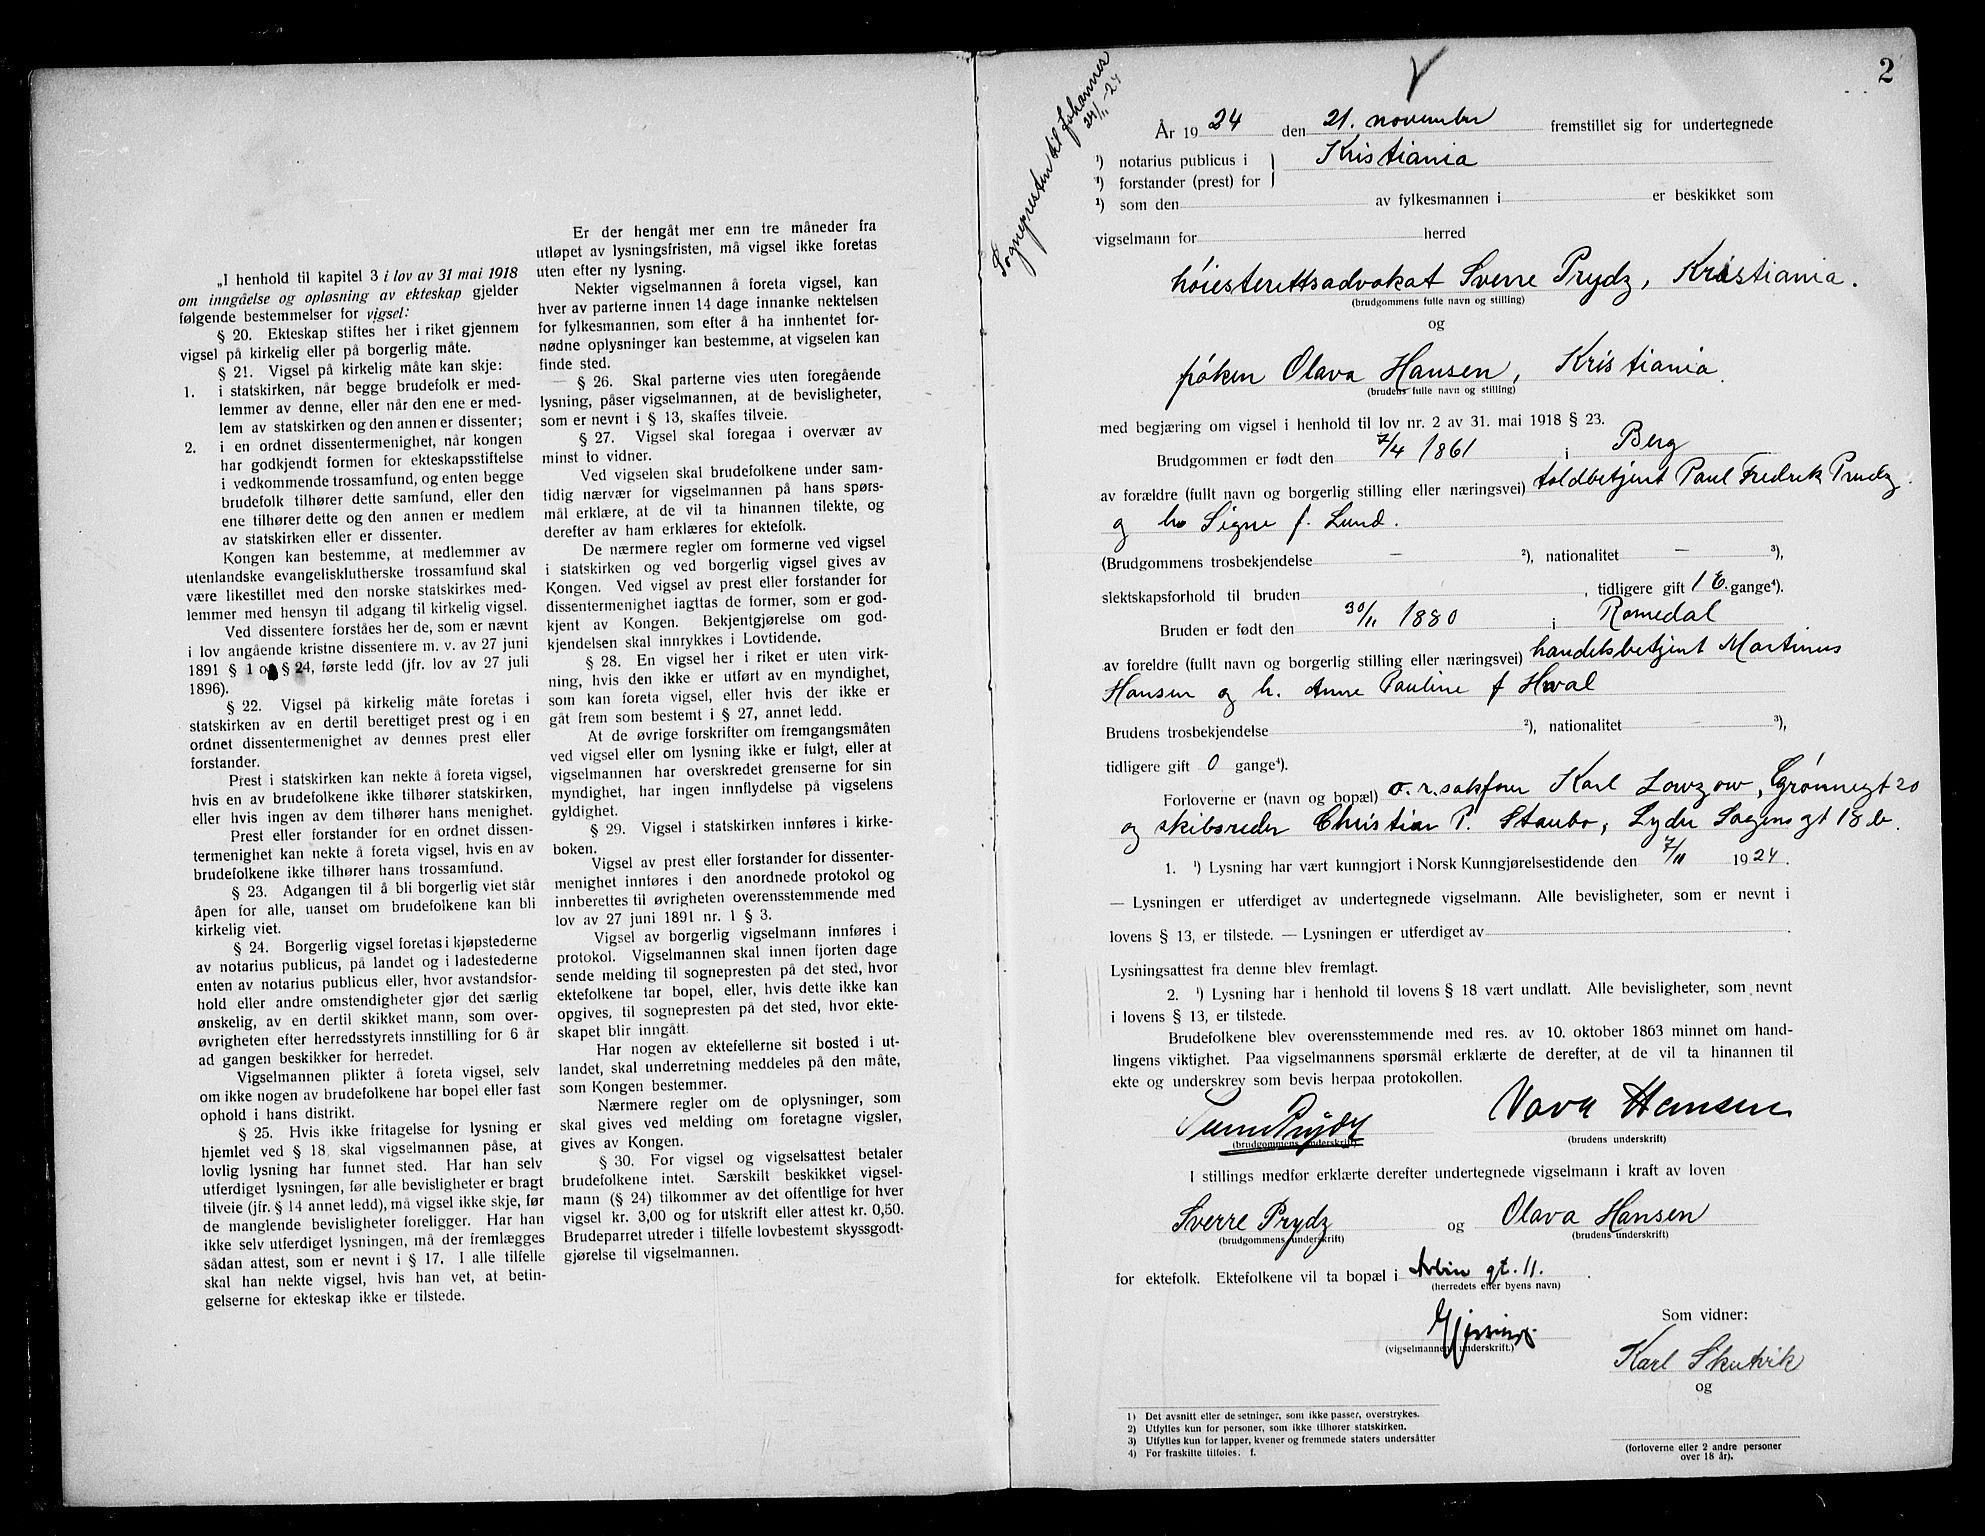 SAO, Oslo byfogd avd. I, L/Lb/Lbb/L0017: Notarialprotokoll, rekke II: Vigsler, 1924-1926, s. 1b-2a